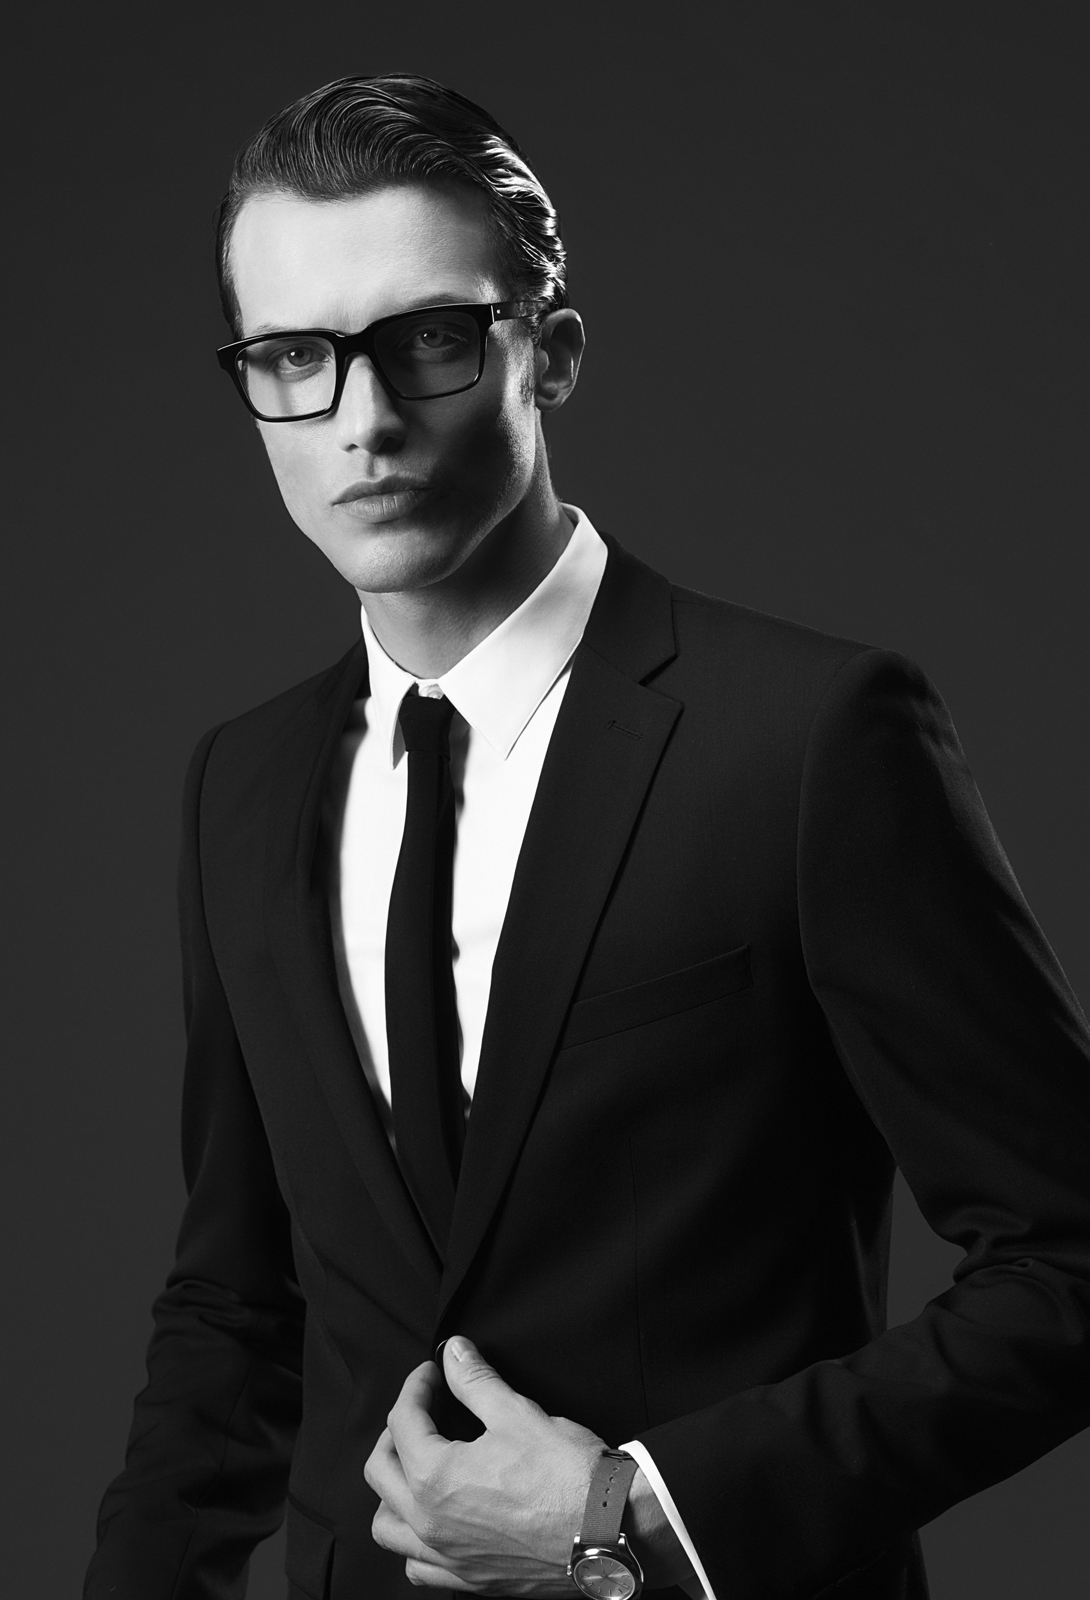 Michael lunettes Risbel Magazine Leonor Greyl